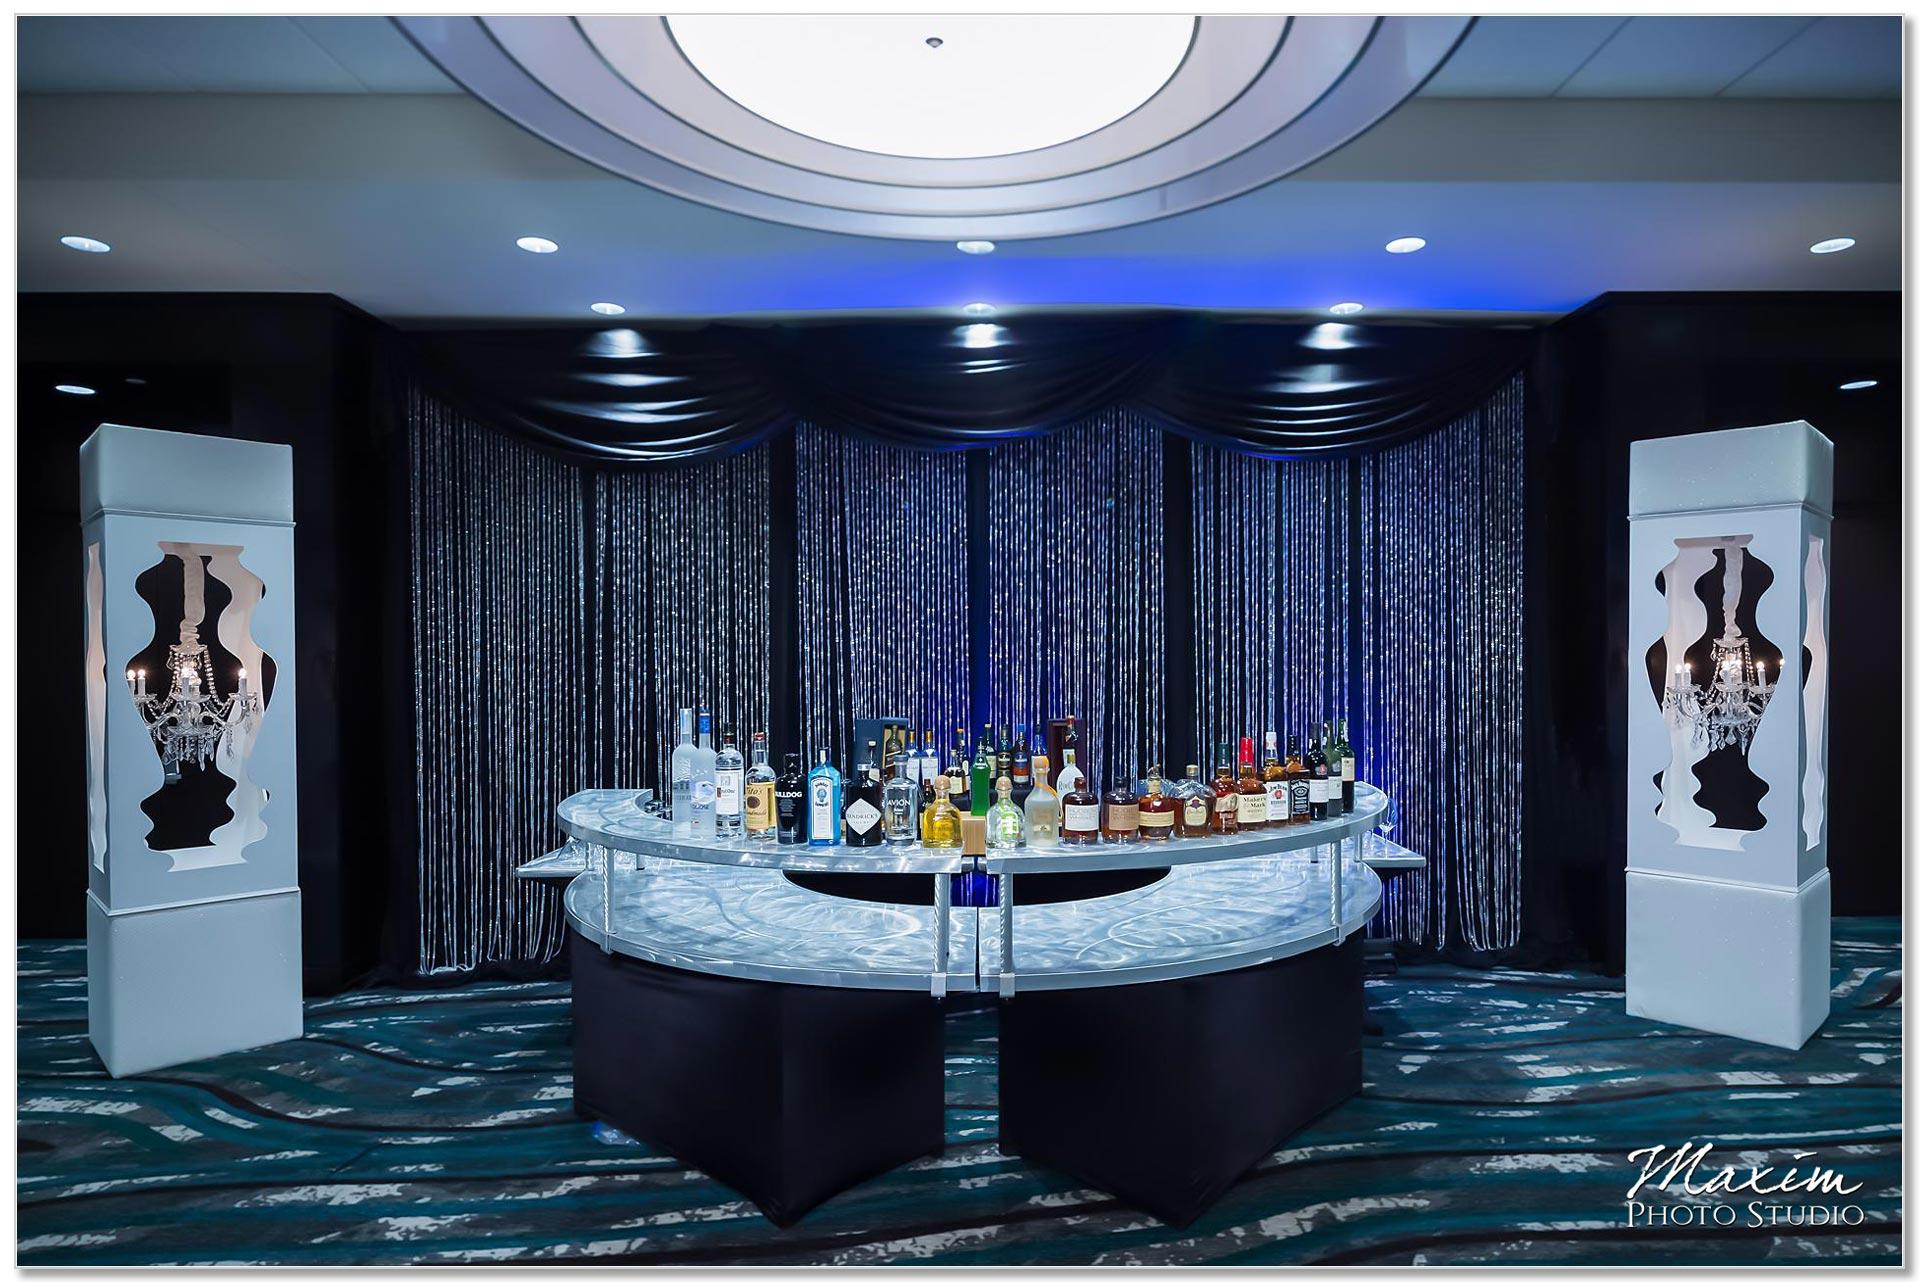 Centre Park West Holiday Inn Wedding Decor reception